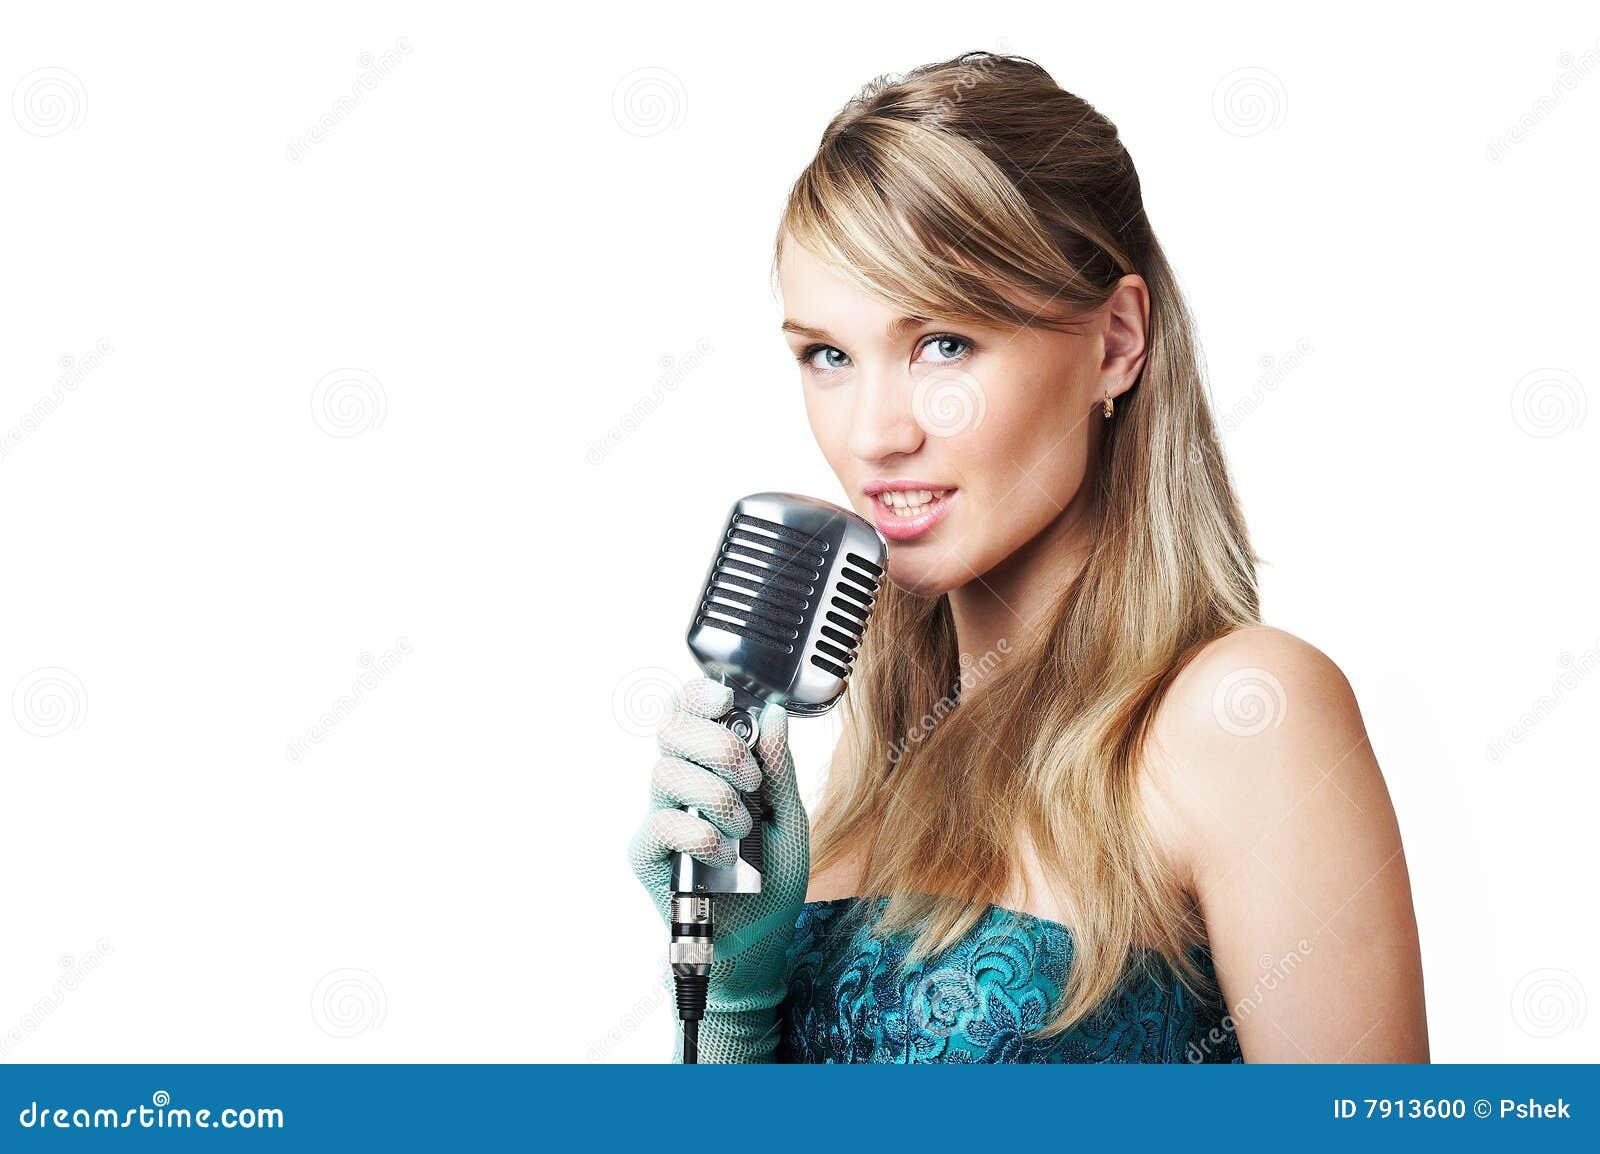 singing the girl retro - photo #19